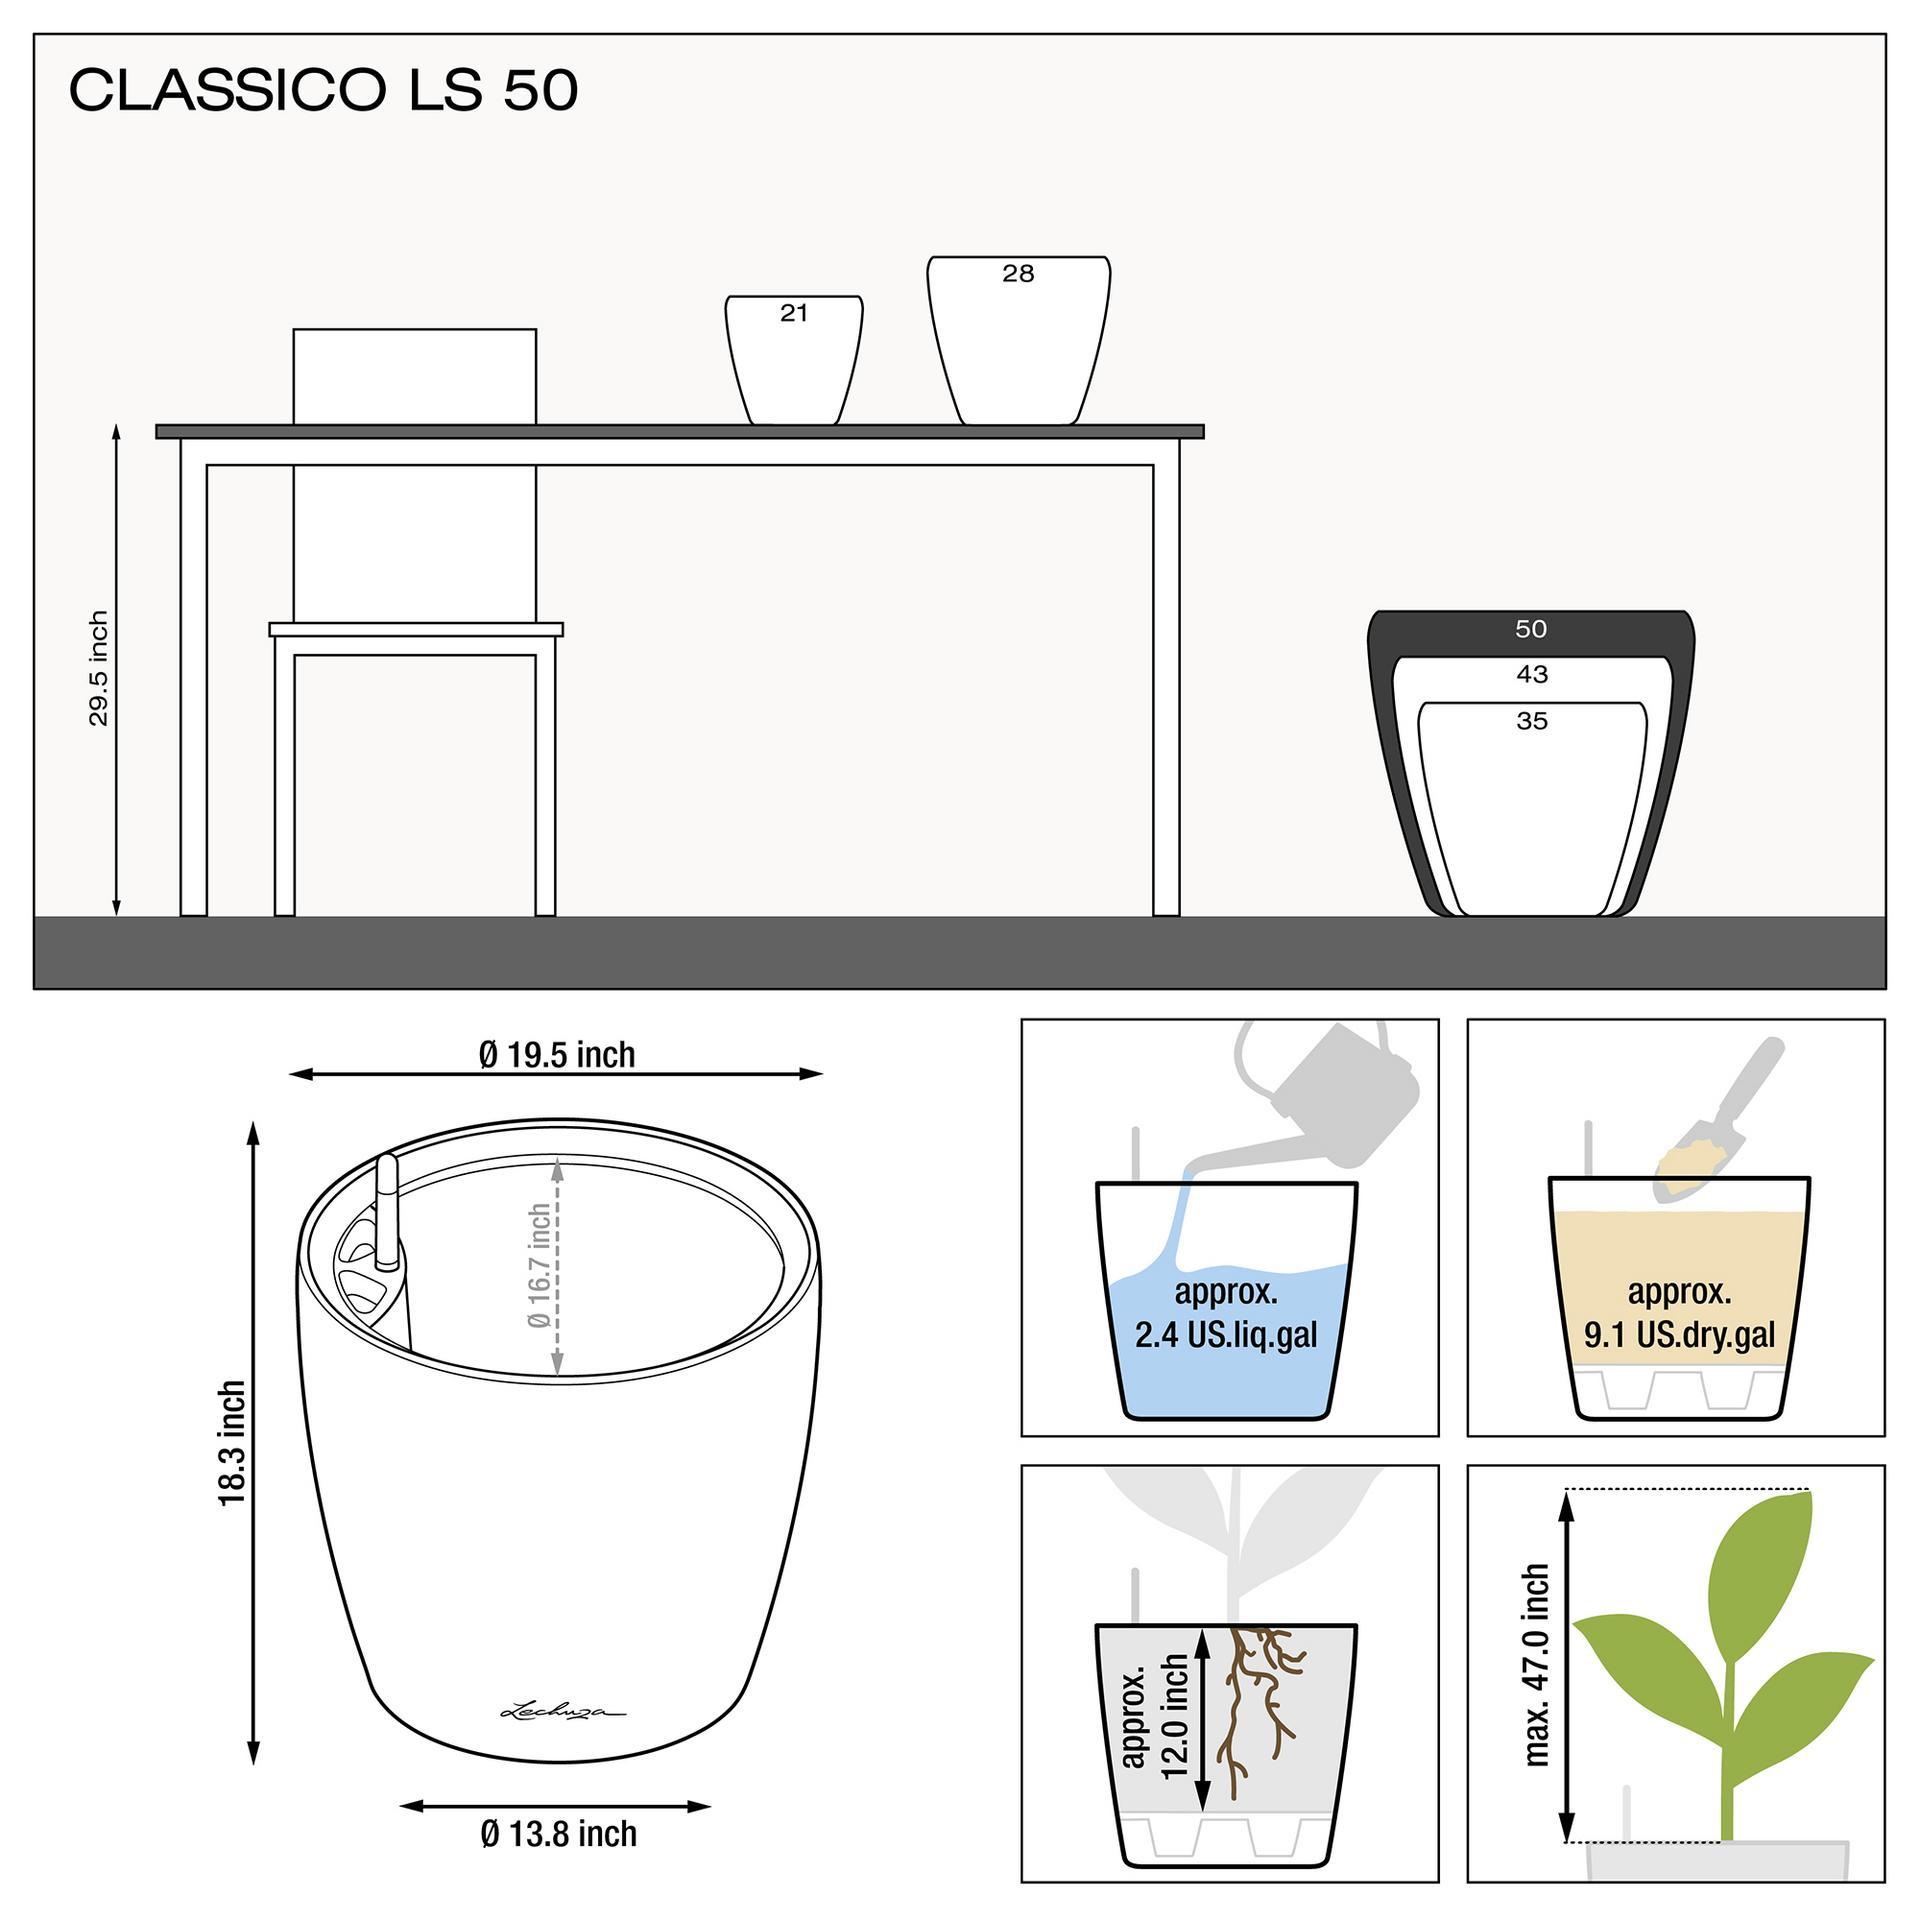 le_classico-ls50_product_addi_nz_us